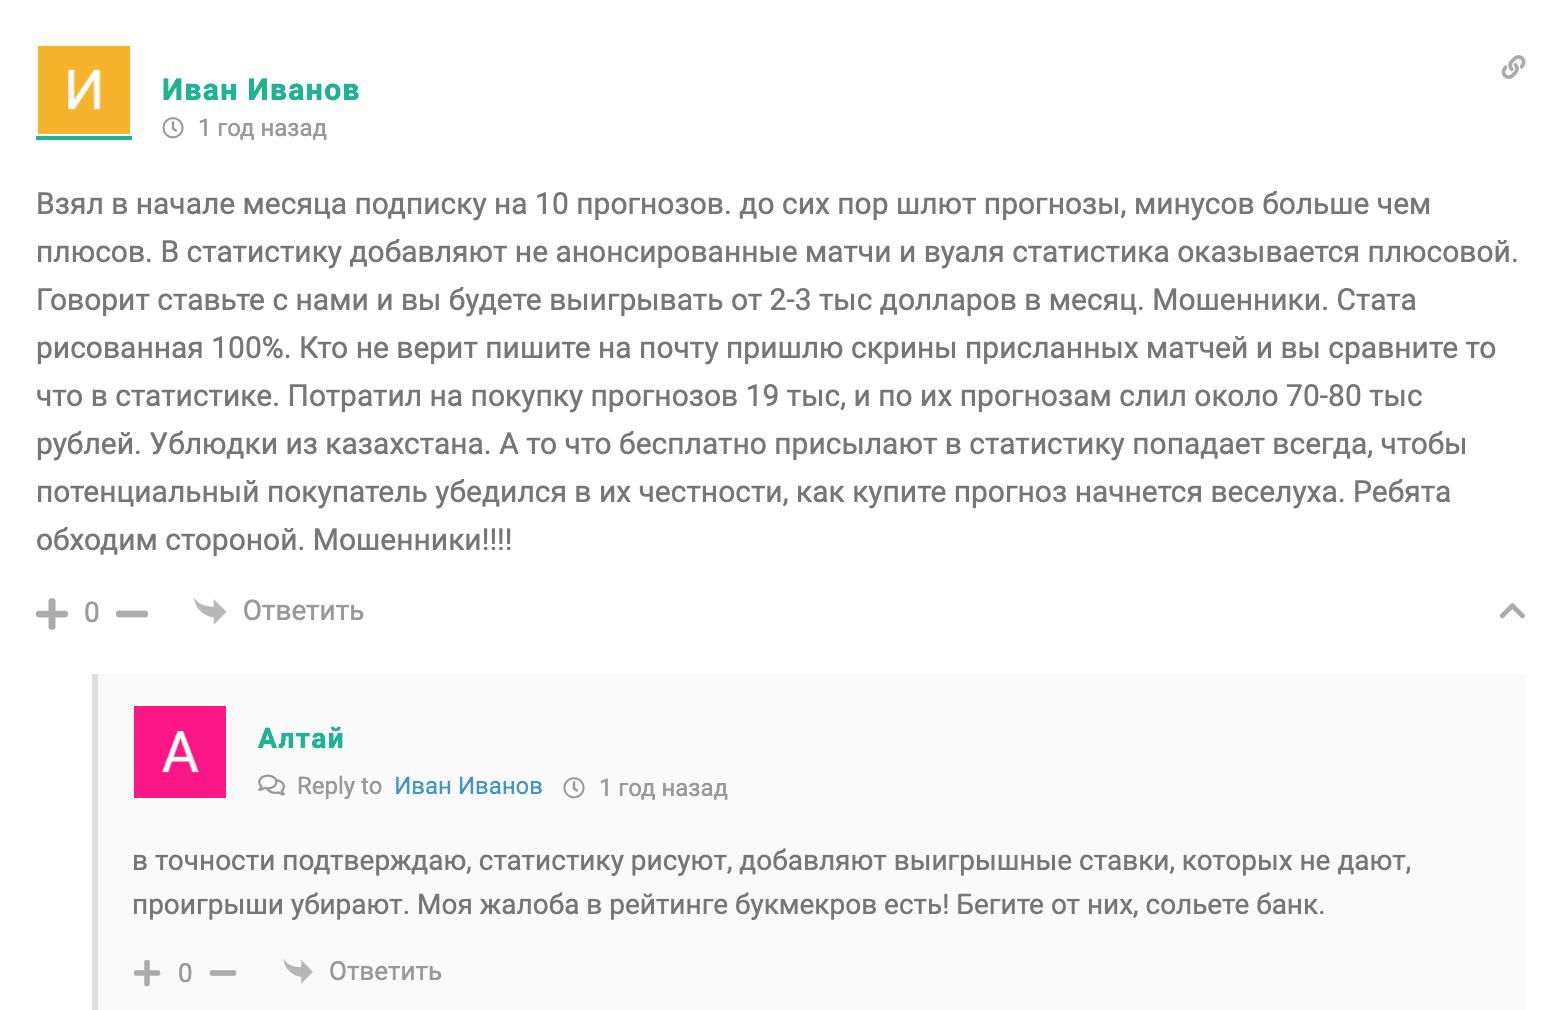 Отзывы о сайте www Barsa kz (Барса кз)